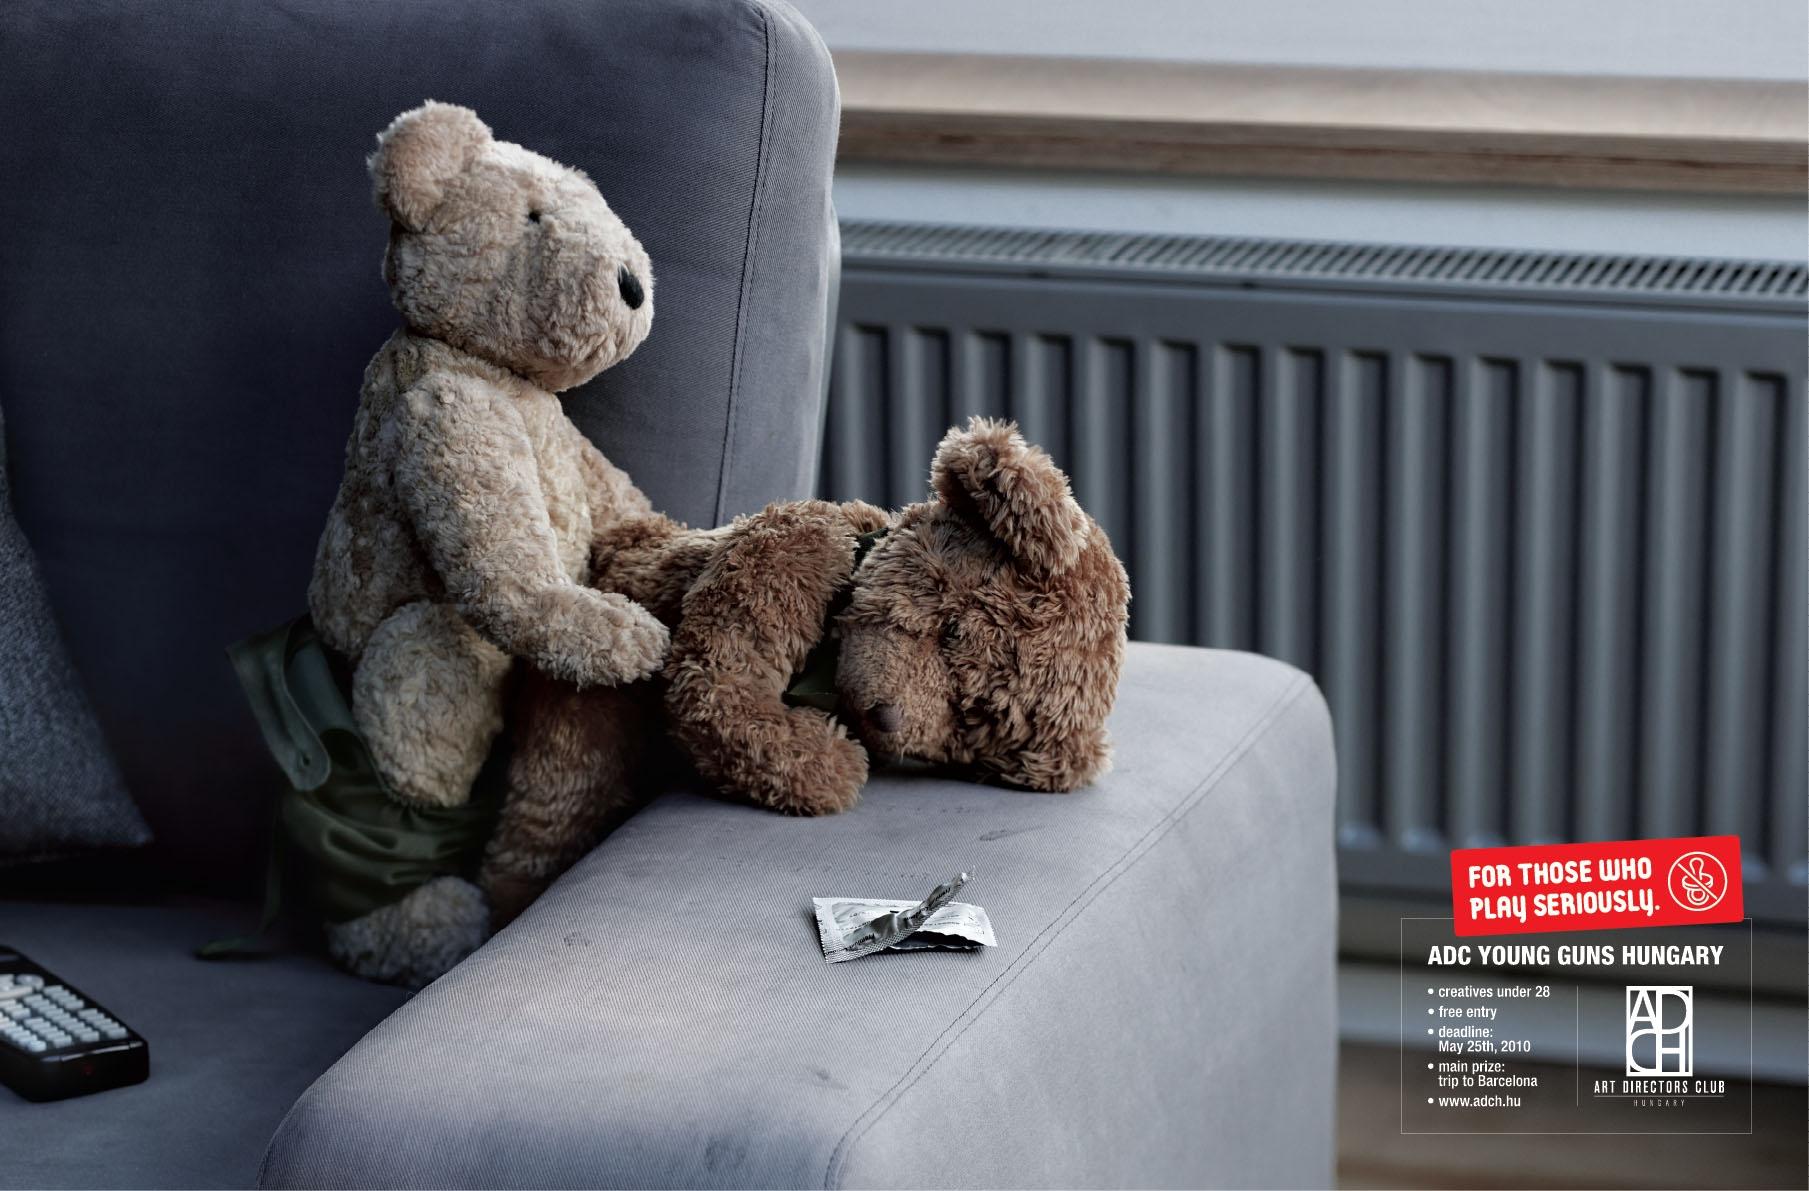 Реклама презерватива мультик, прикольная реклама презервативов Видео на 7 фотография